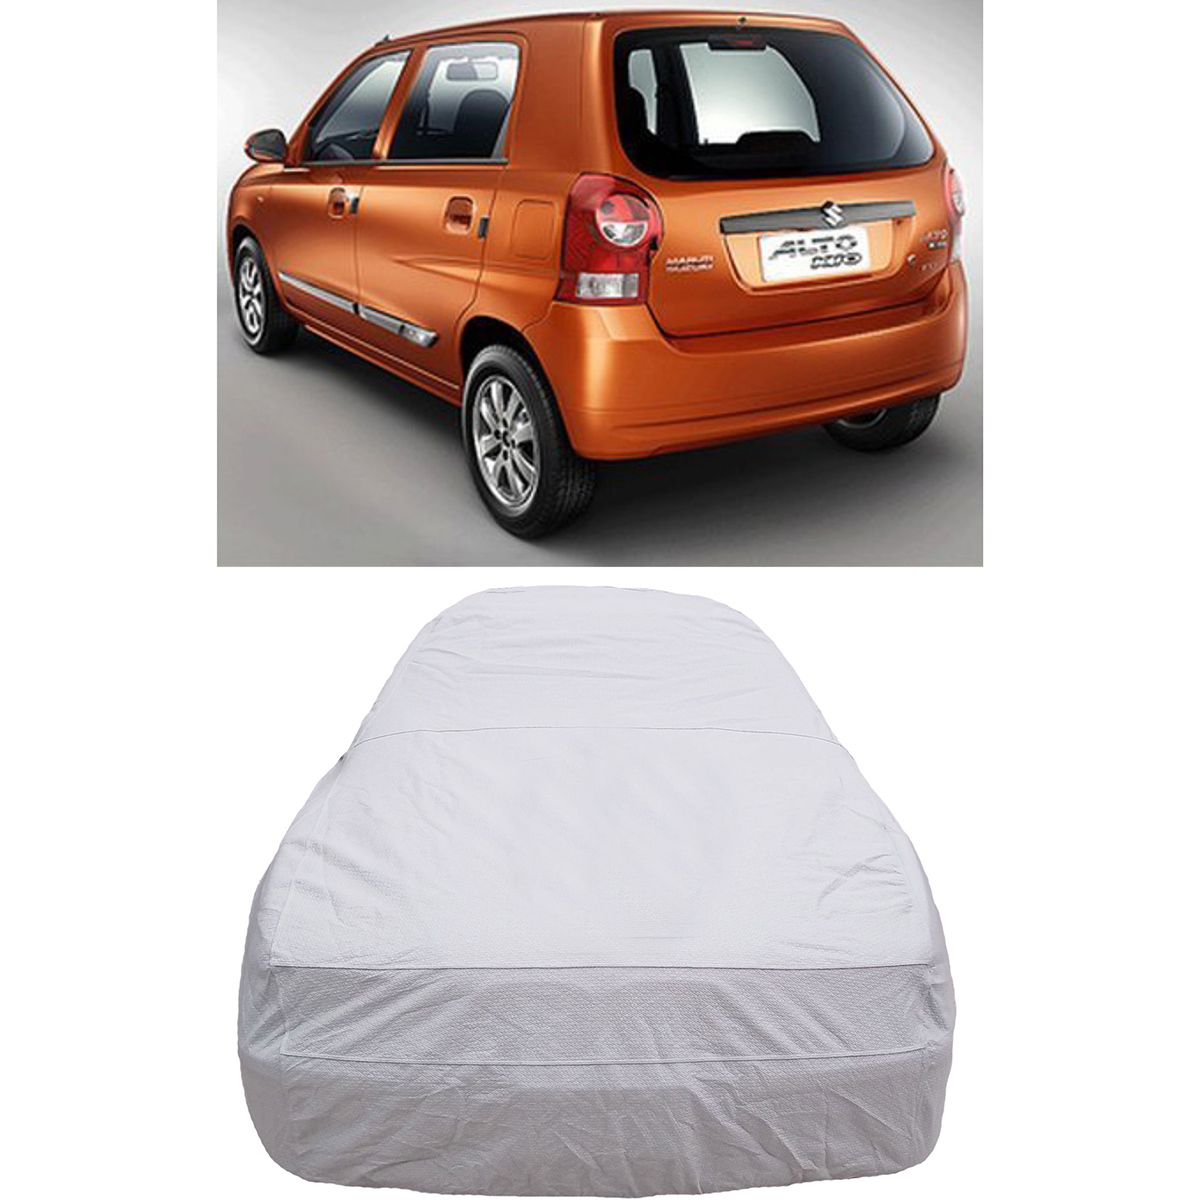 Buy digitru car body cover for maruti suzuki alto k10 silver online at best price in india on